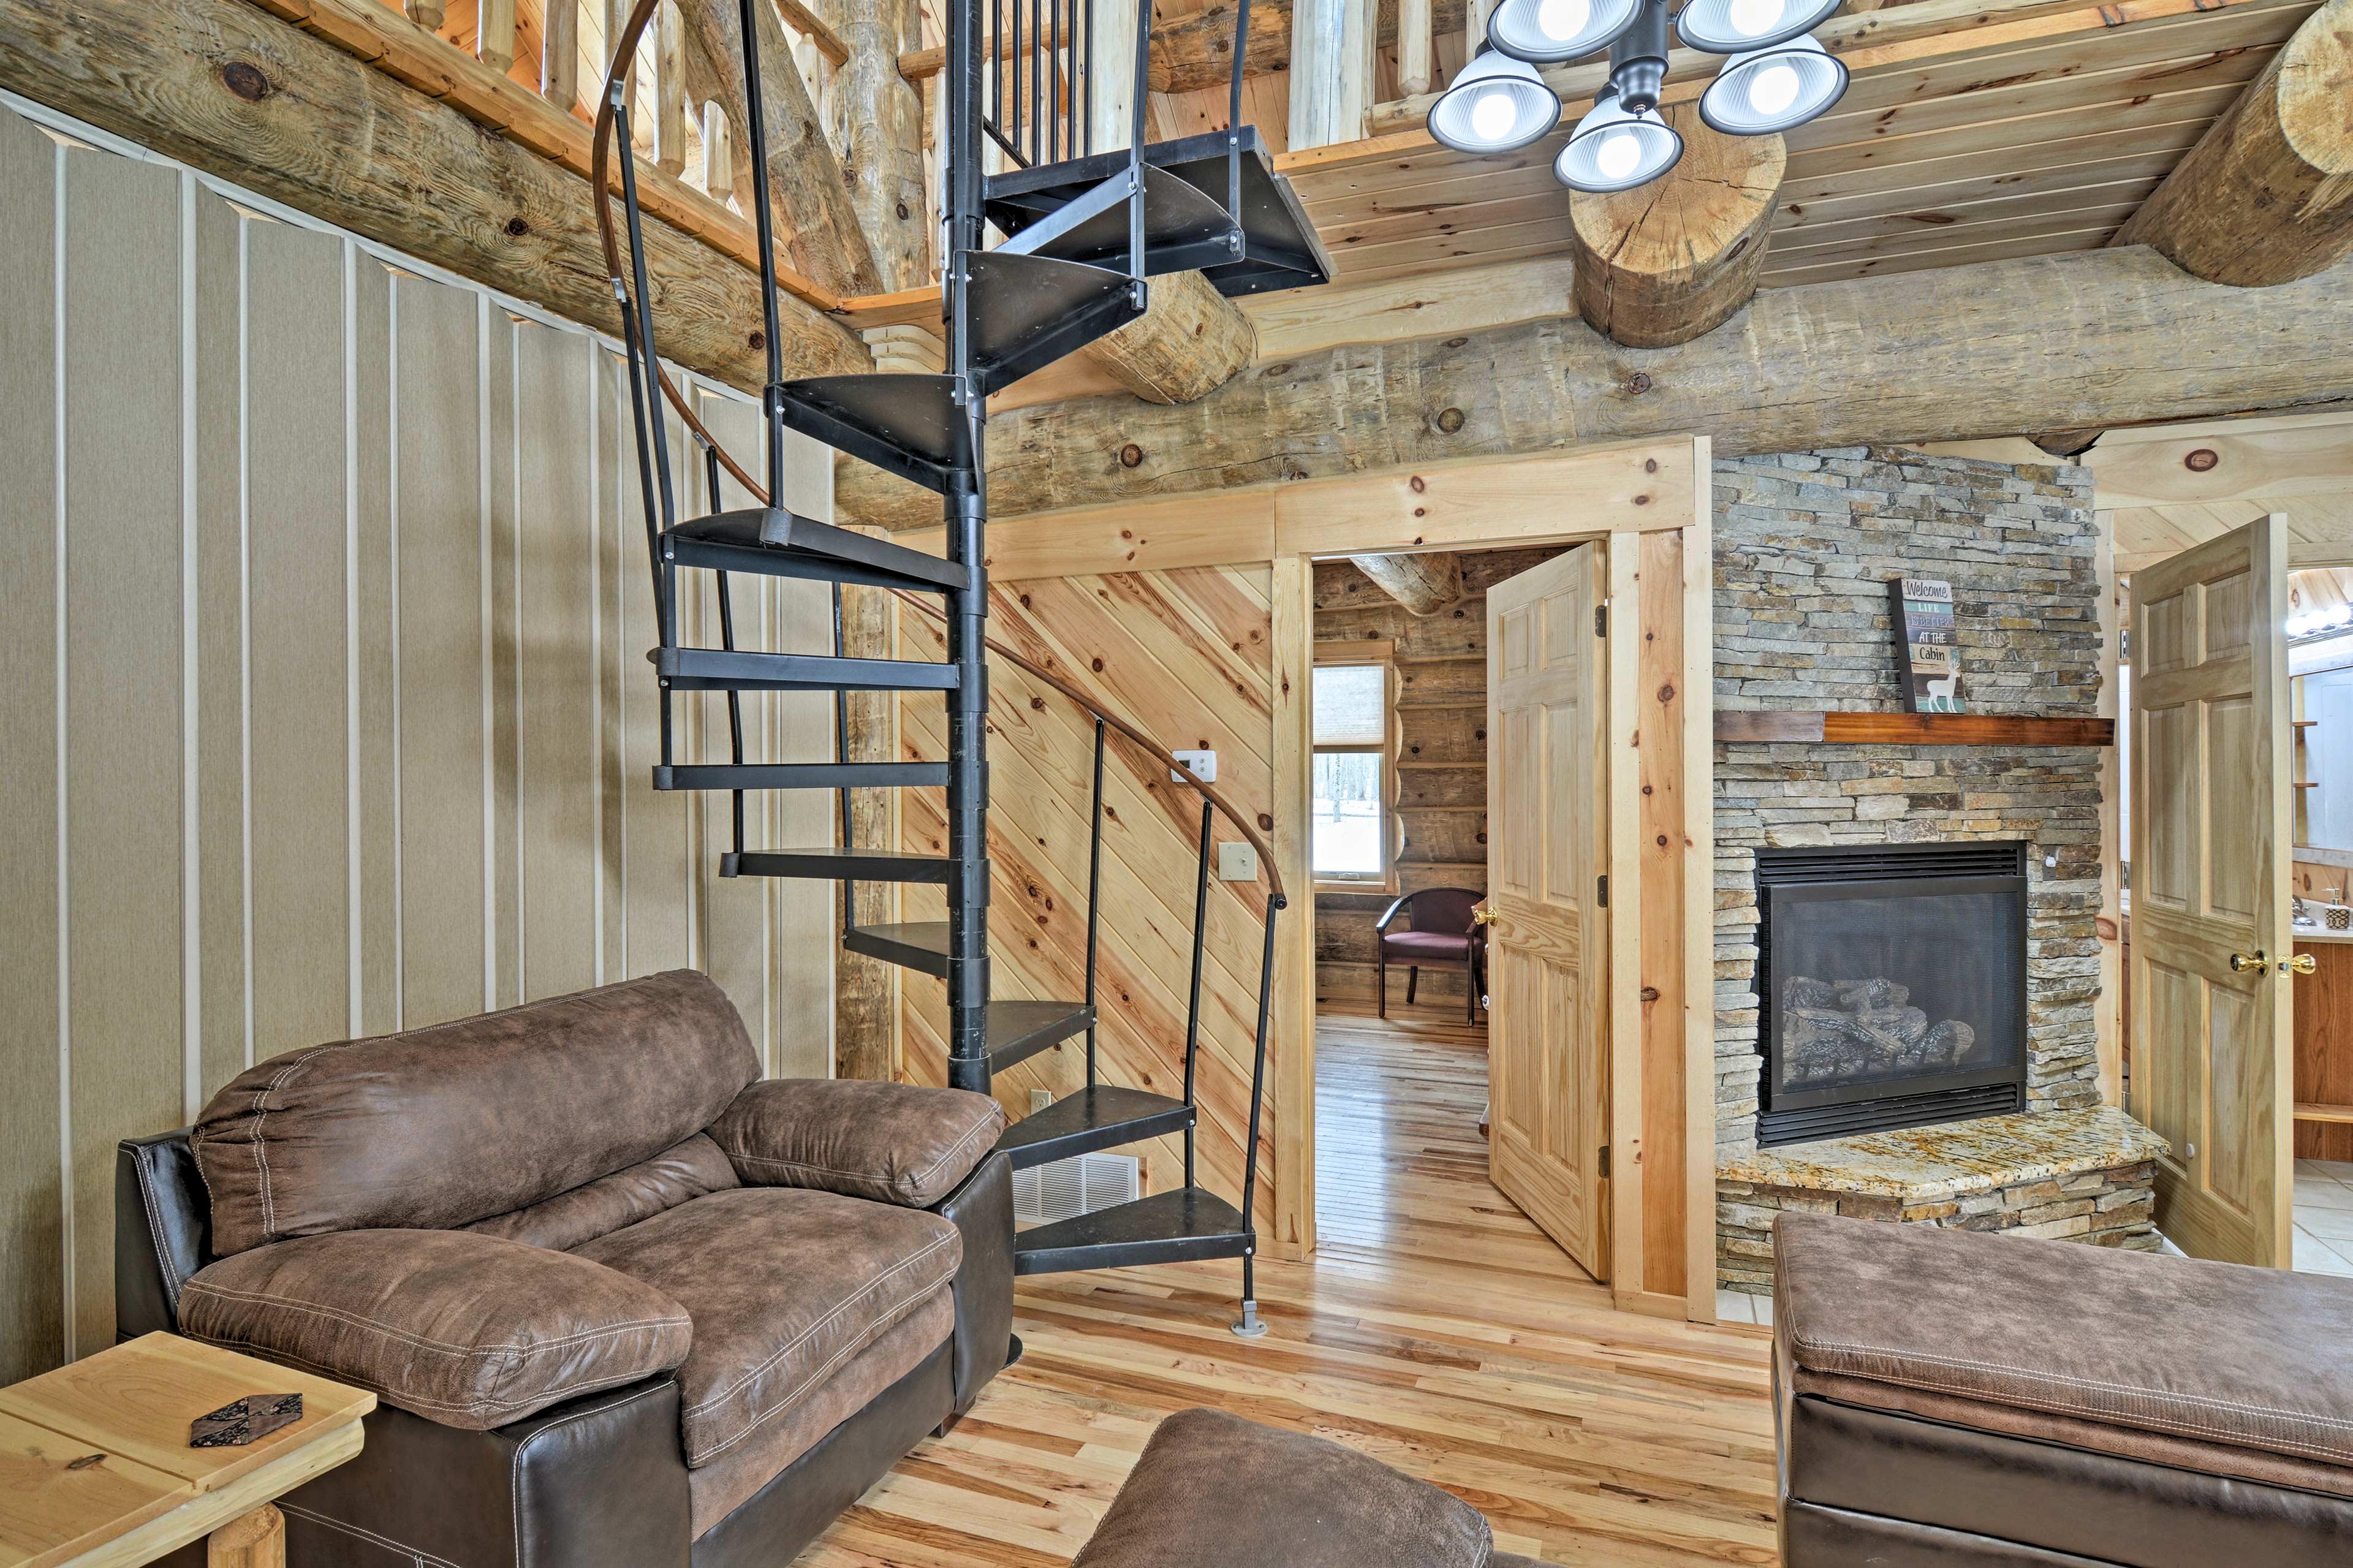 Hardwood floors and log walls exude rustic charm.